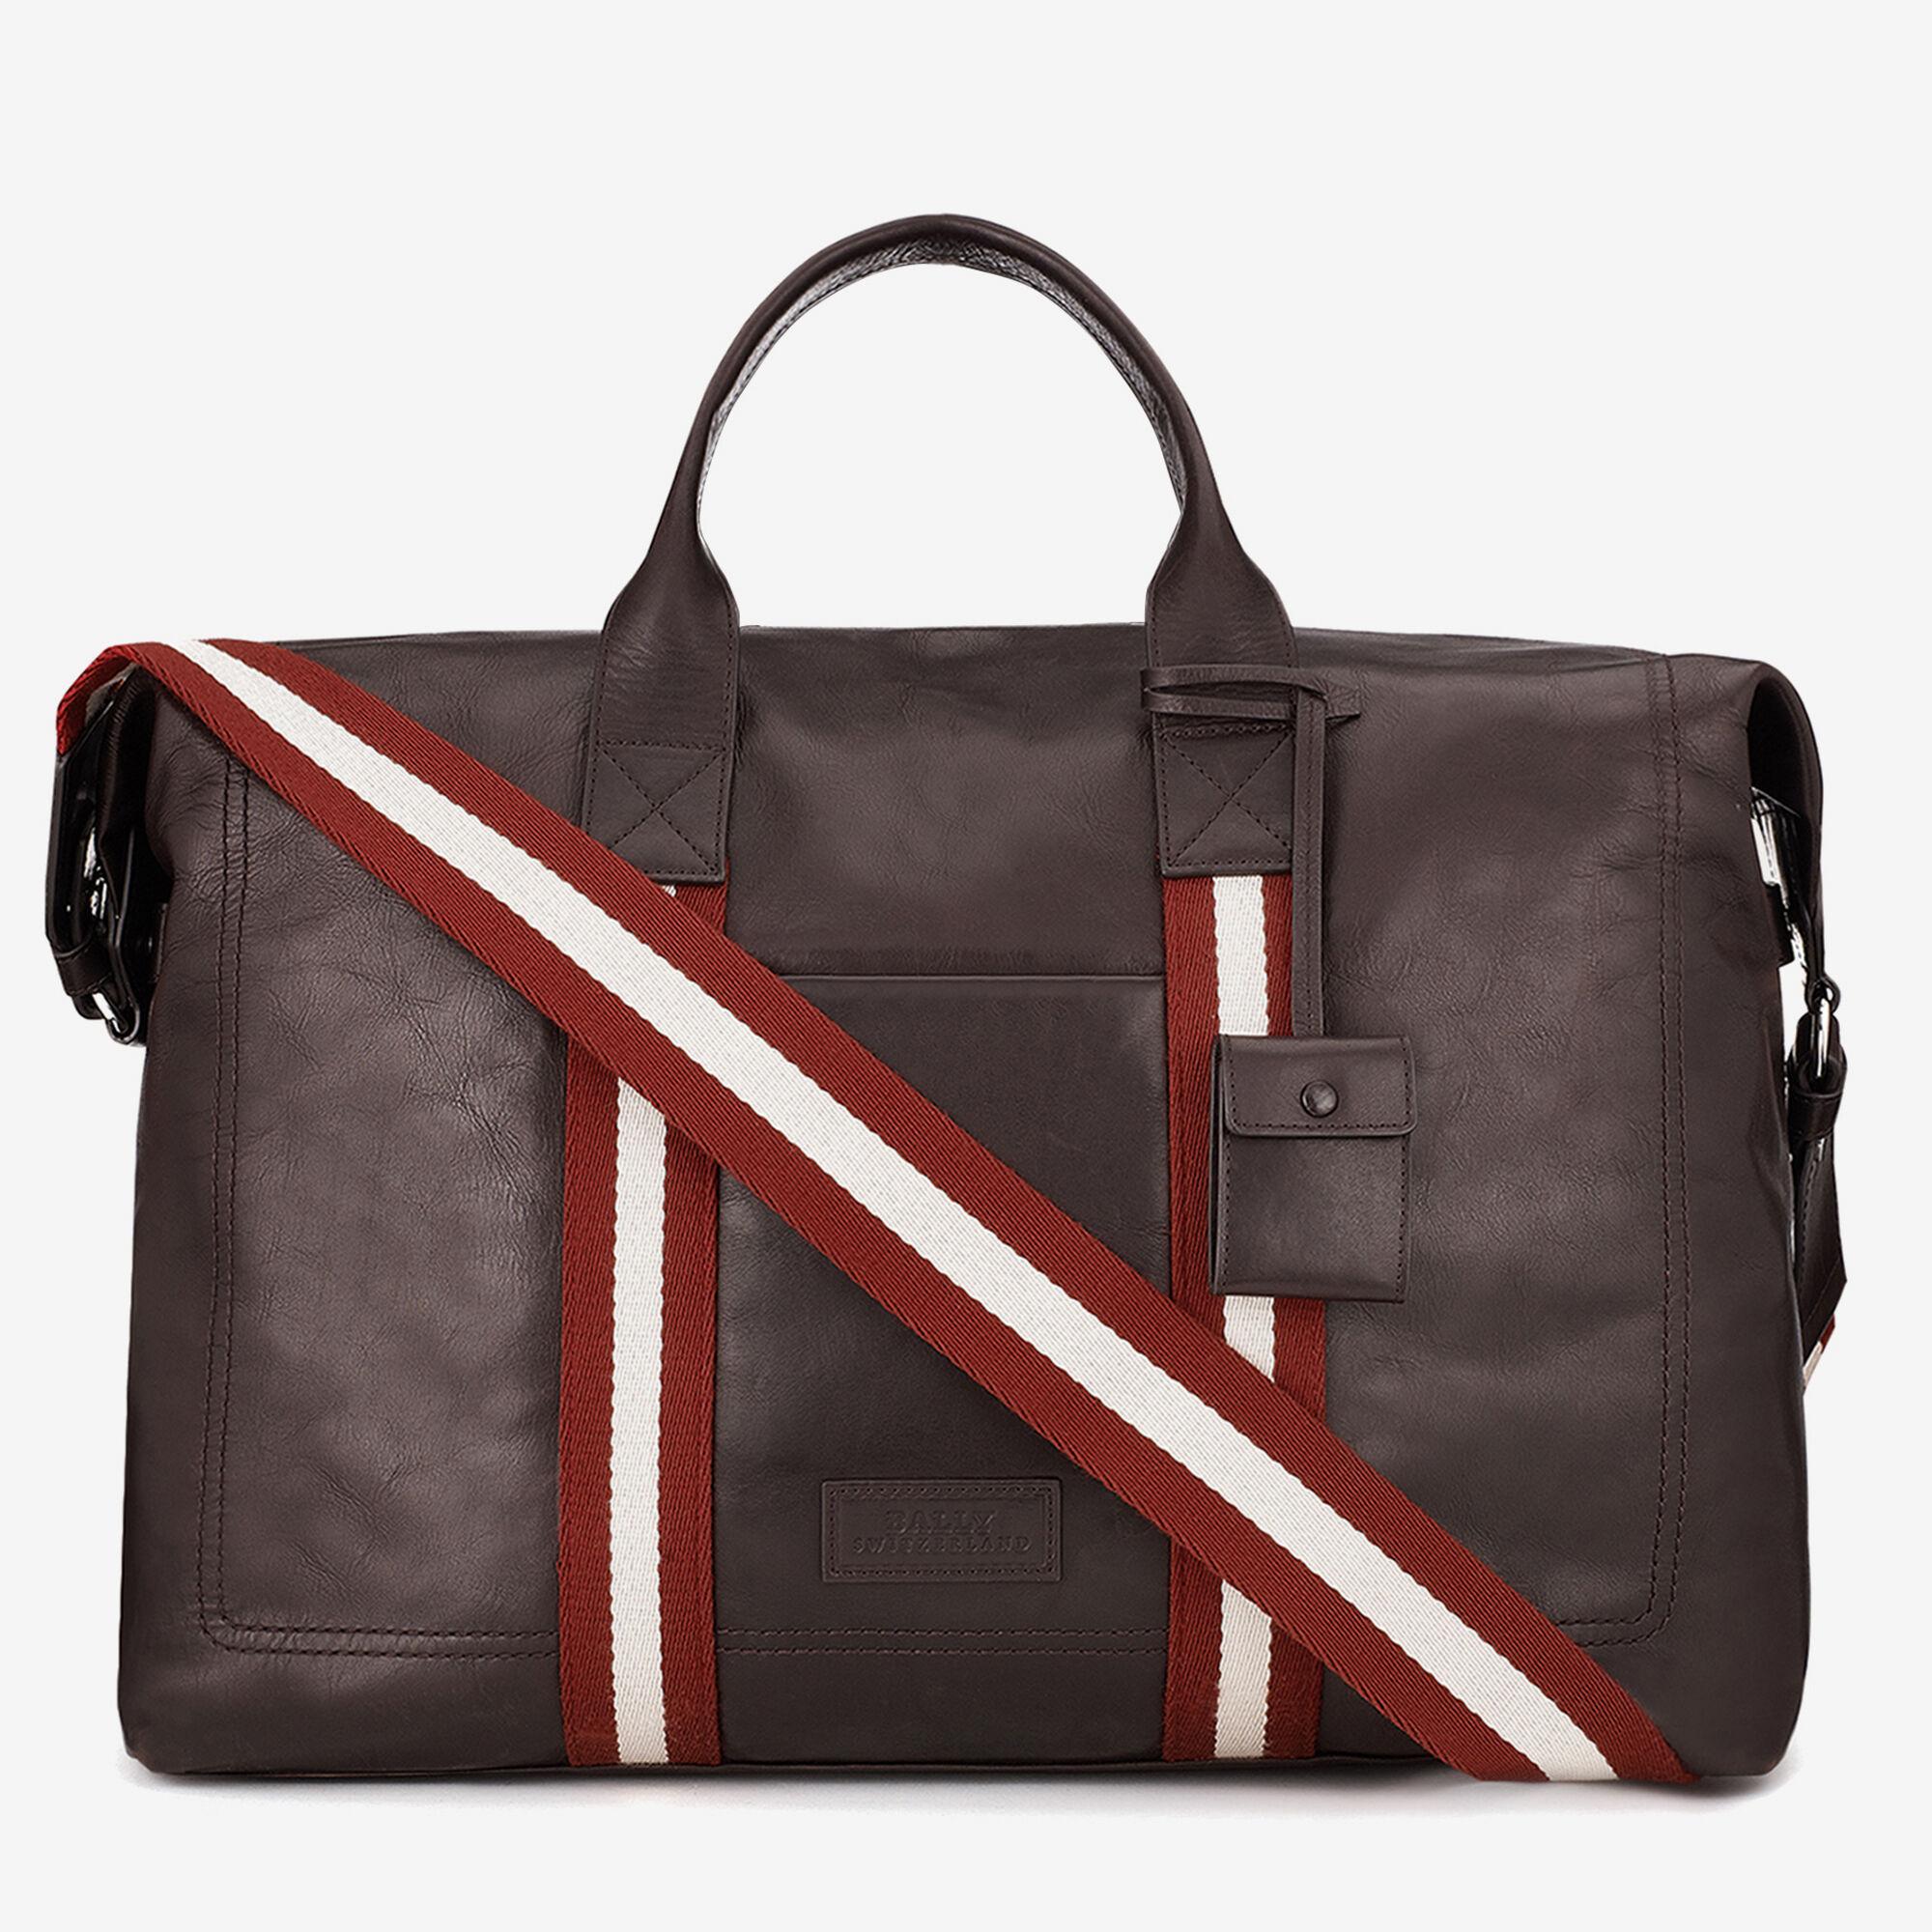 Bally Travel Bag Price Brown Calf Travel Bags Bally